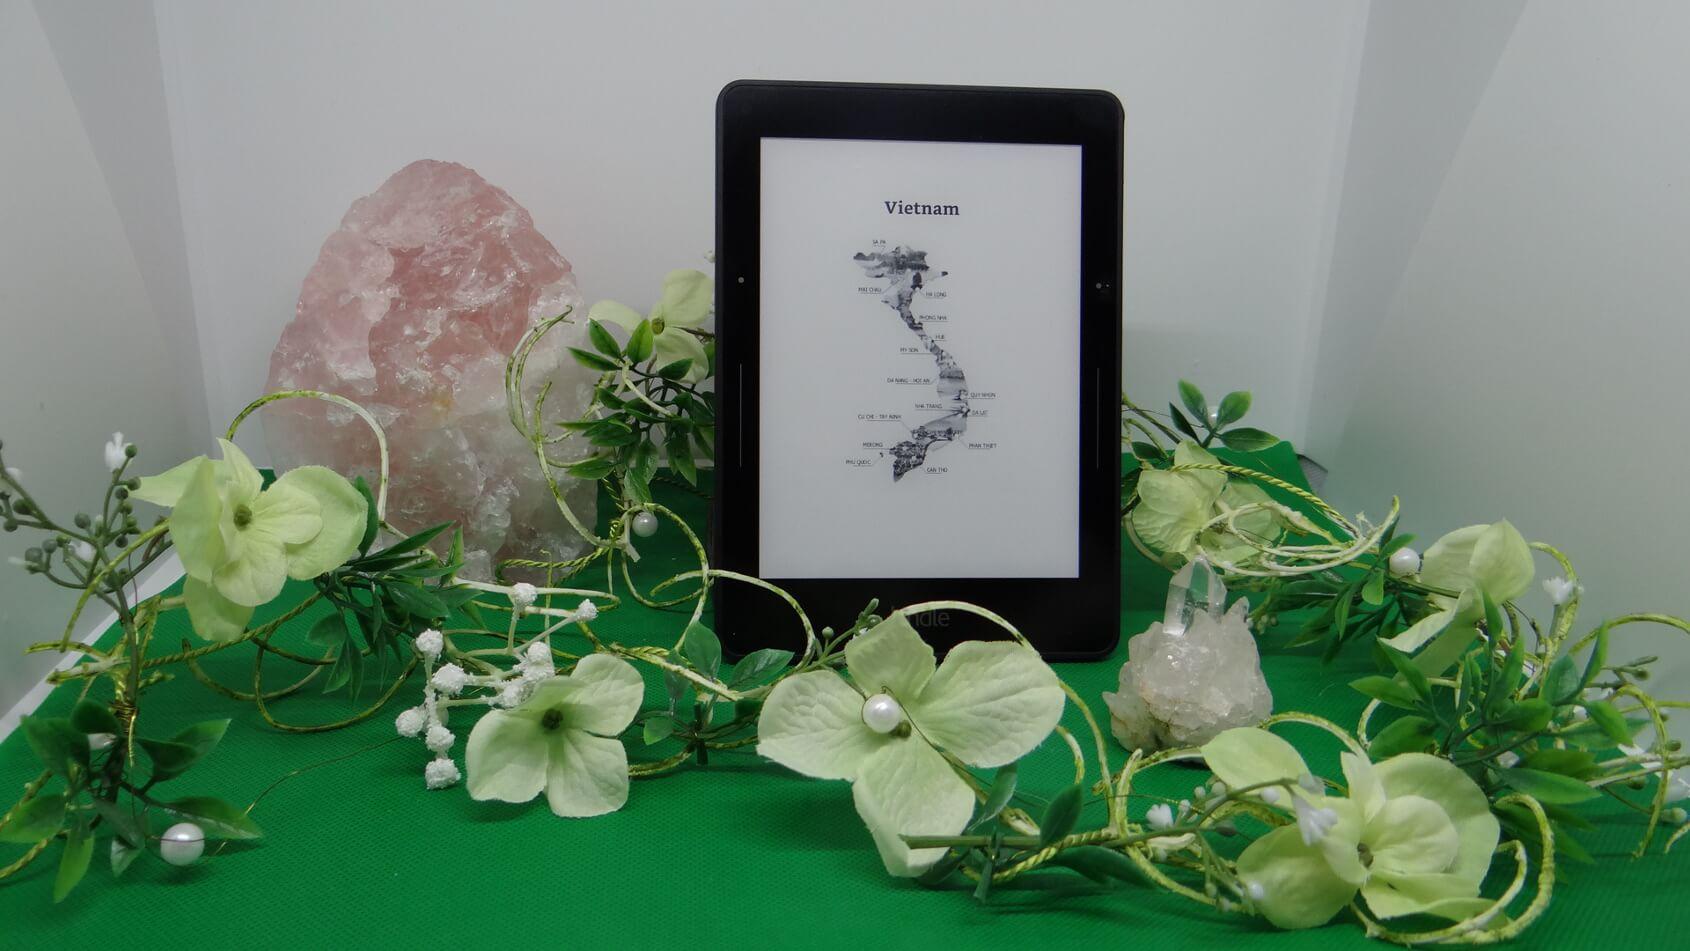 eBook-Formatierung, eBook-Erstellung